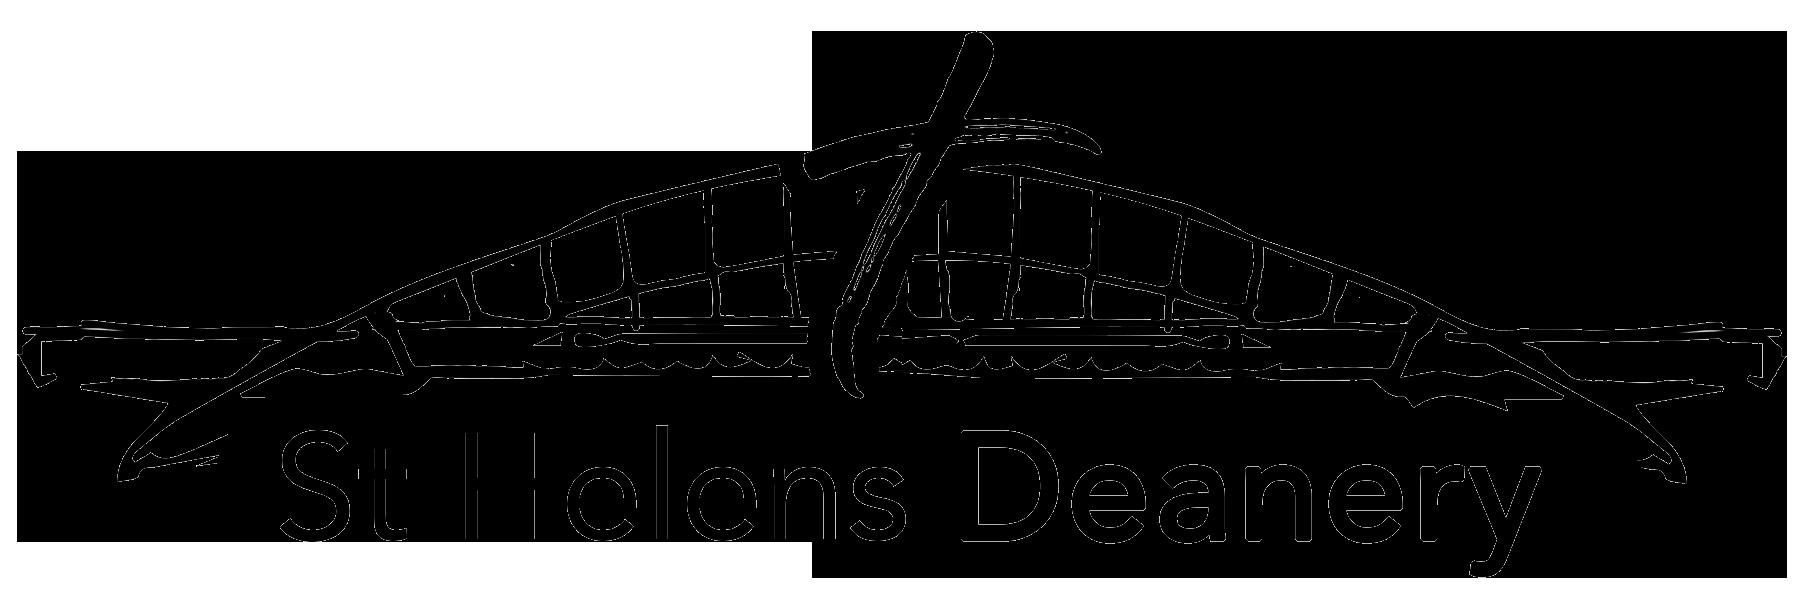 St Helens Deanery